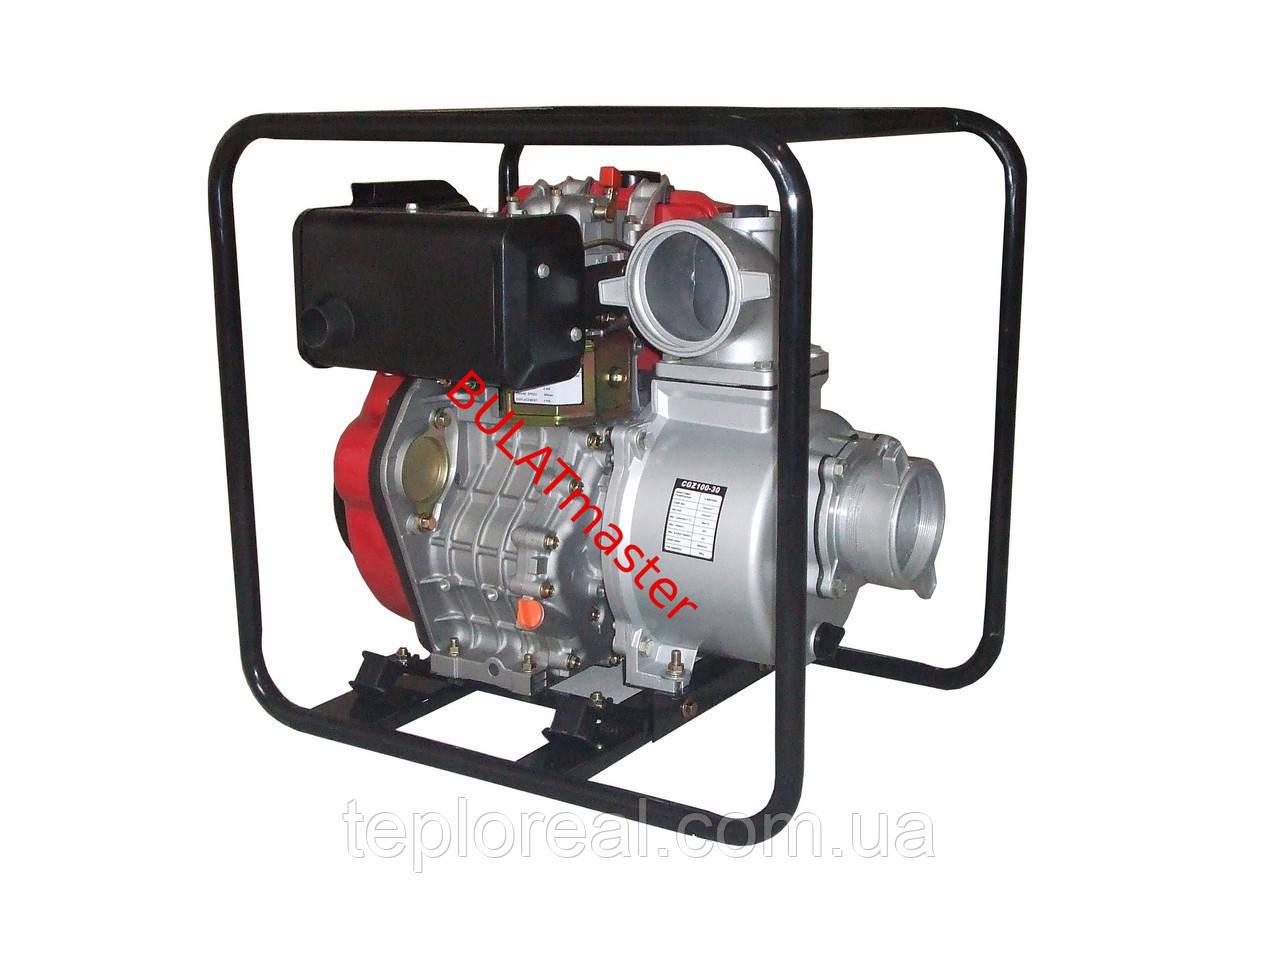 Дизельная помпа WEIMA (Вейма) WMС GZ100-30Е (электростартер)